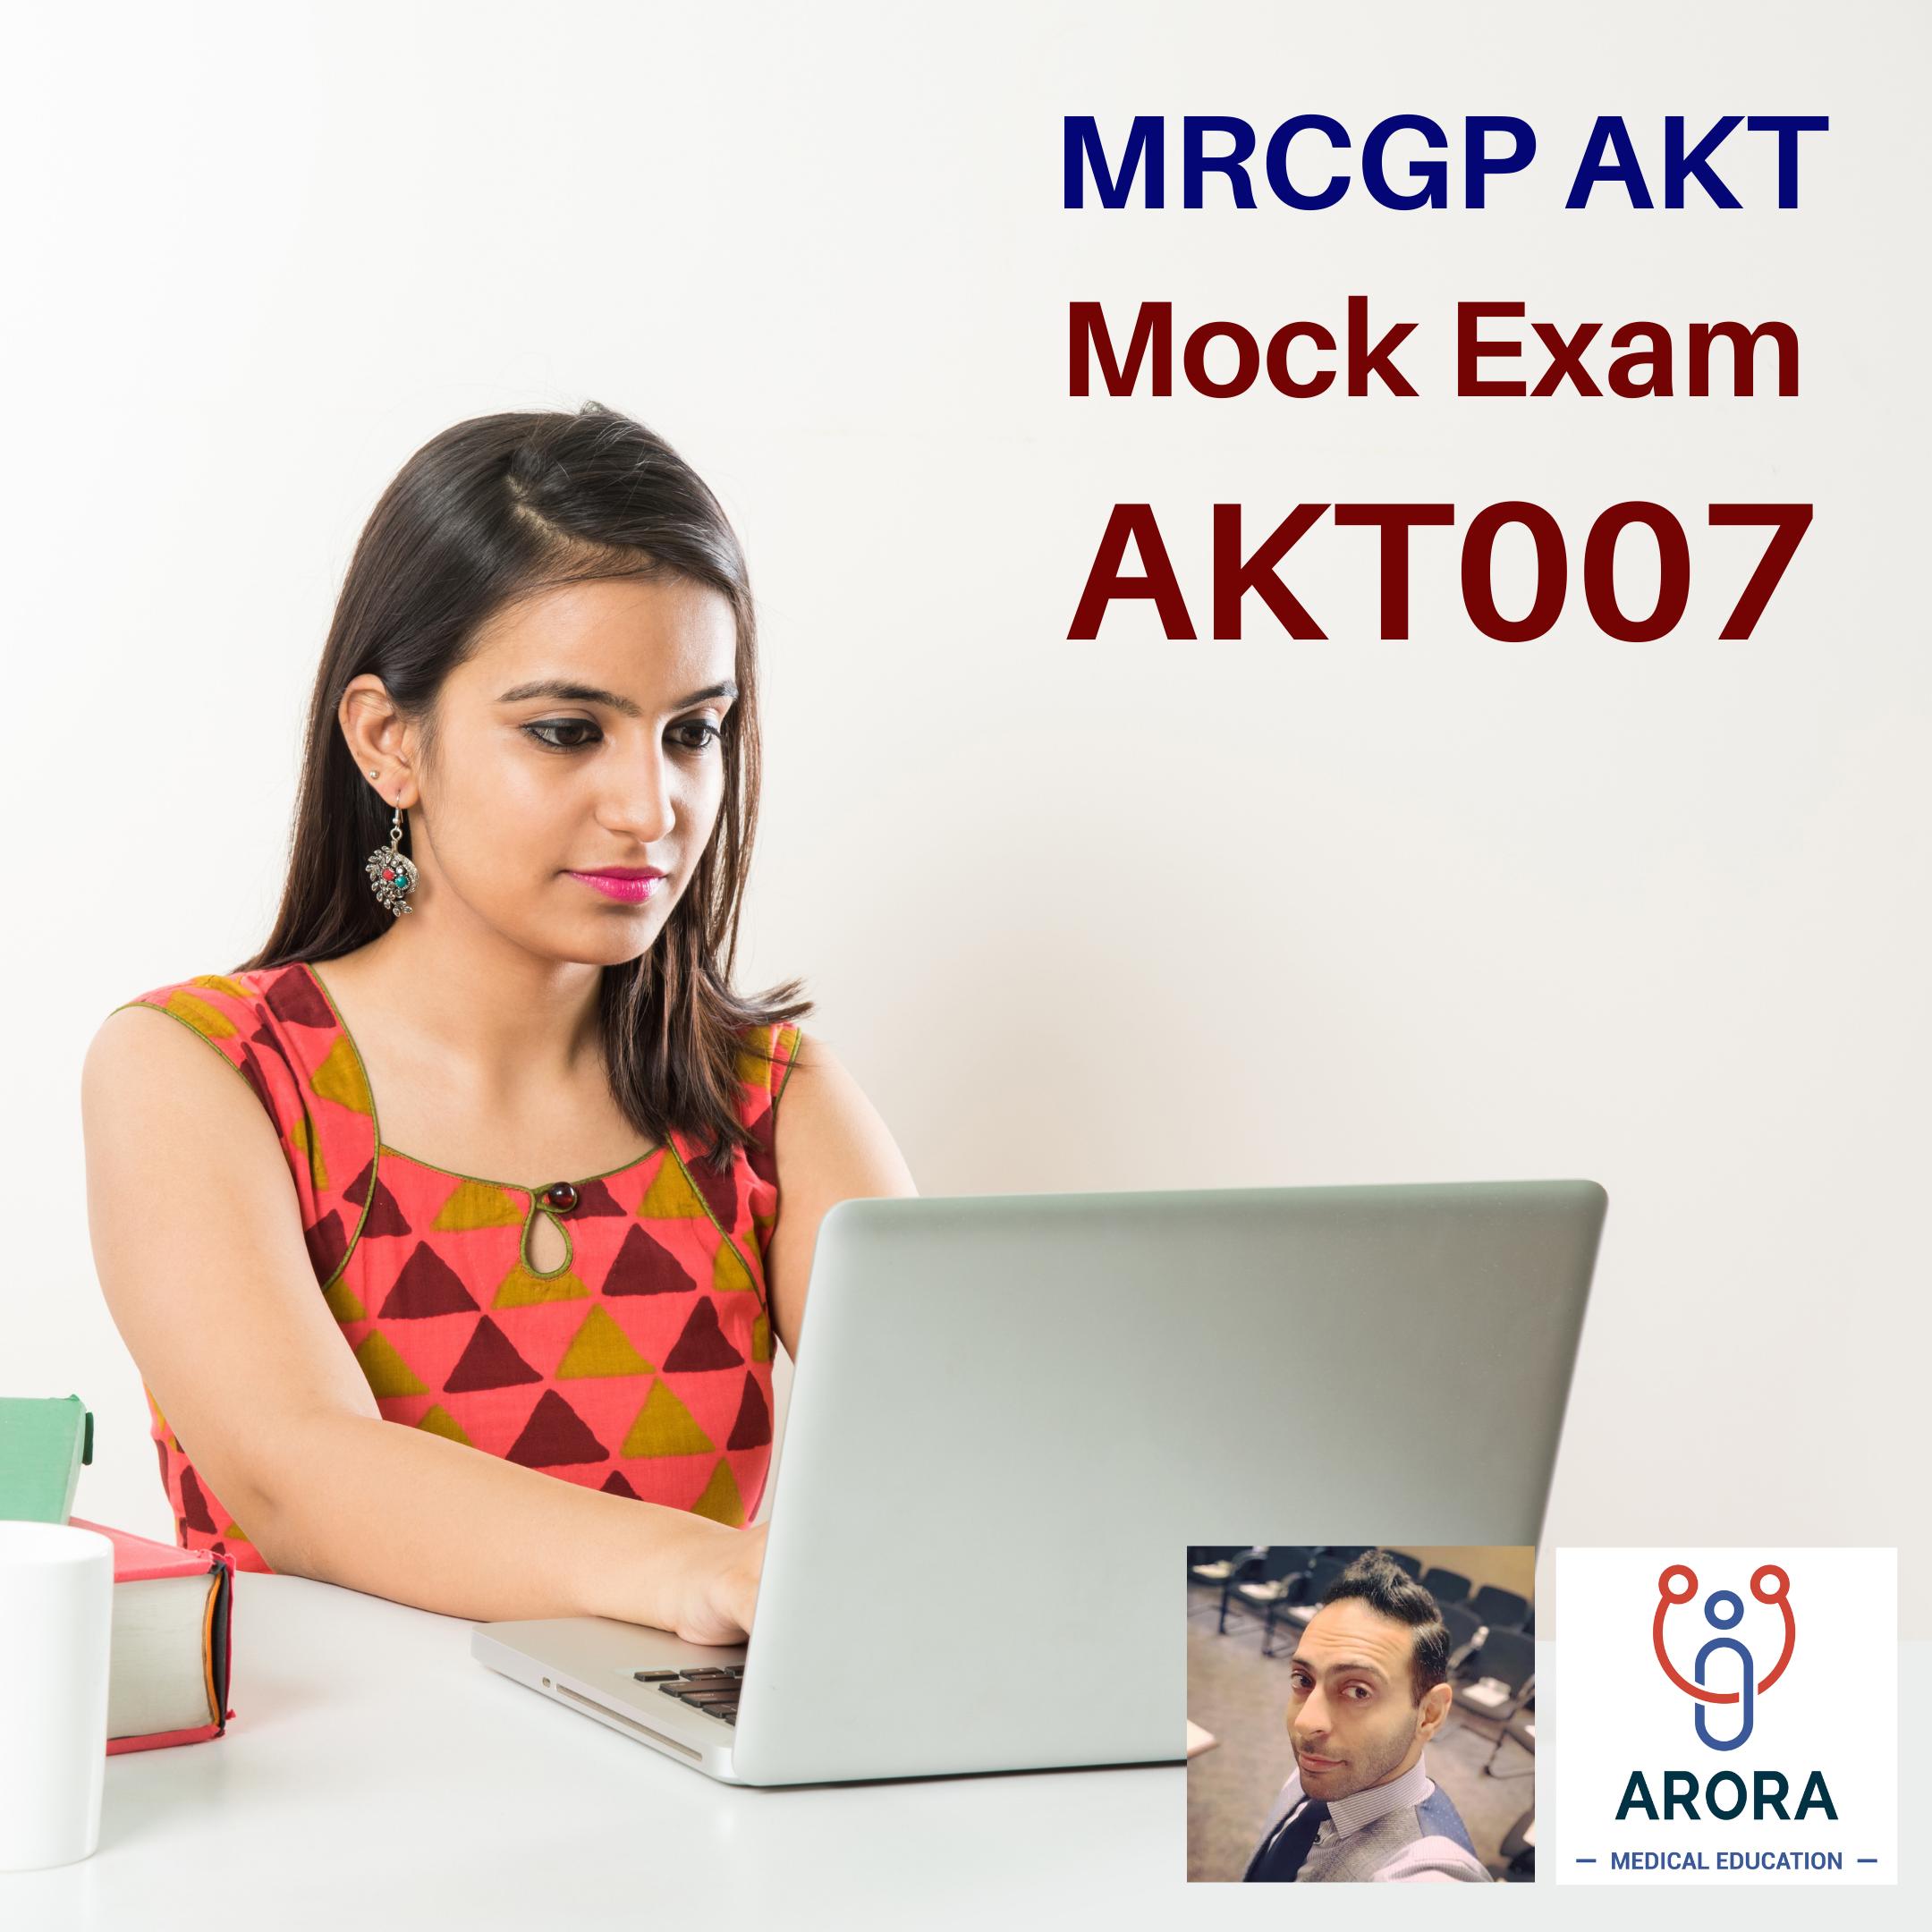 AKT007 Pic - MRCGP CSA, AKT and PLAB Exam Courses and Online Webinars - Arora Medical Education